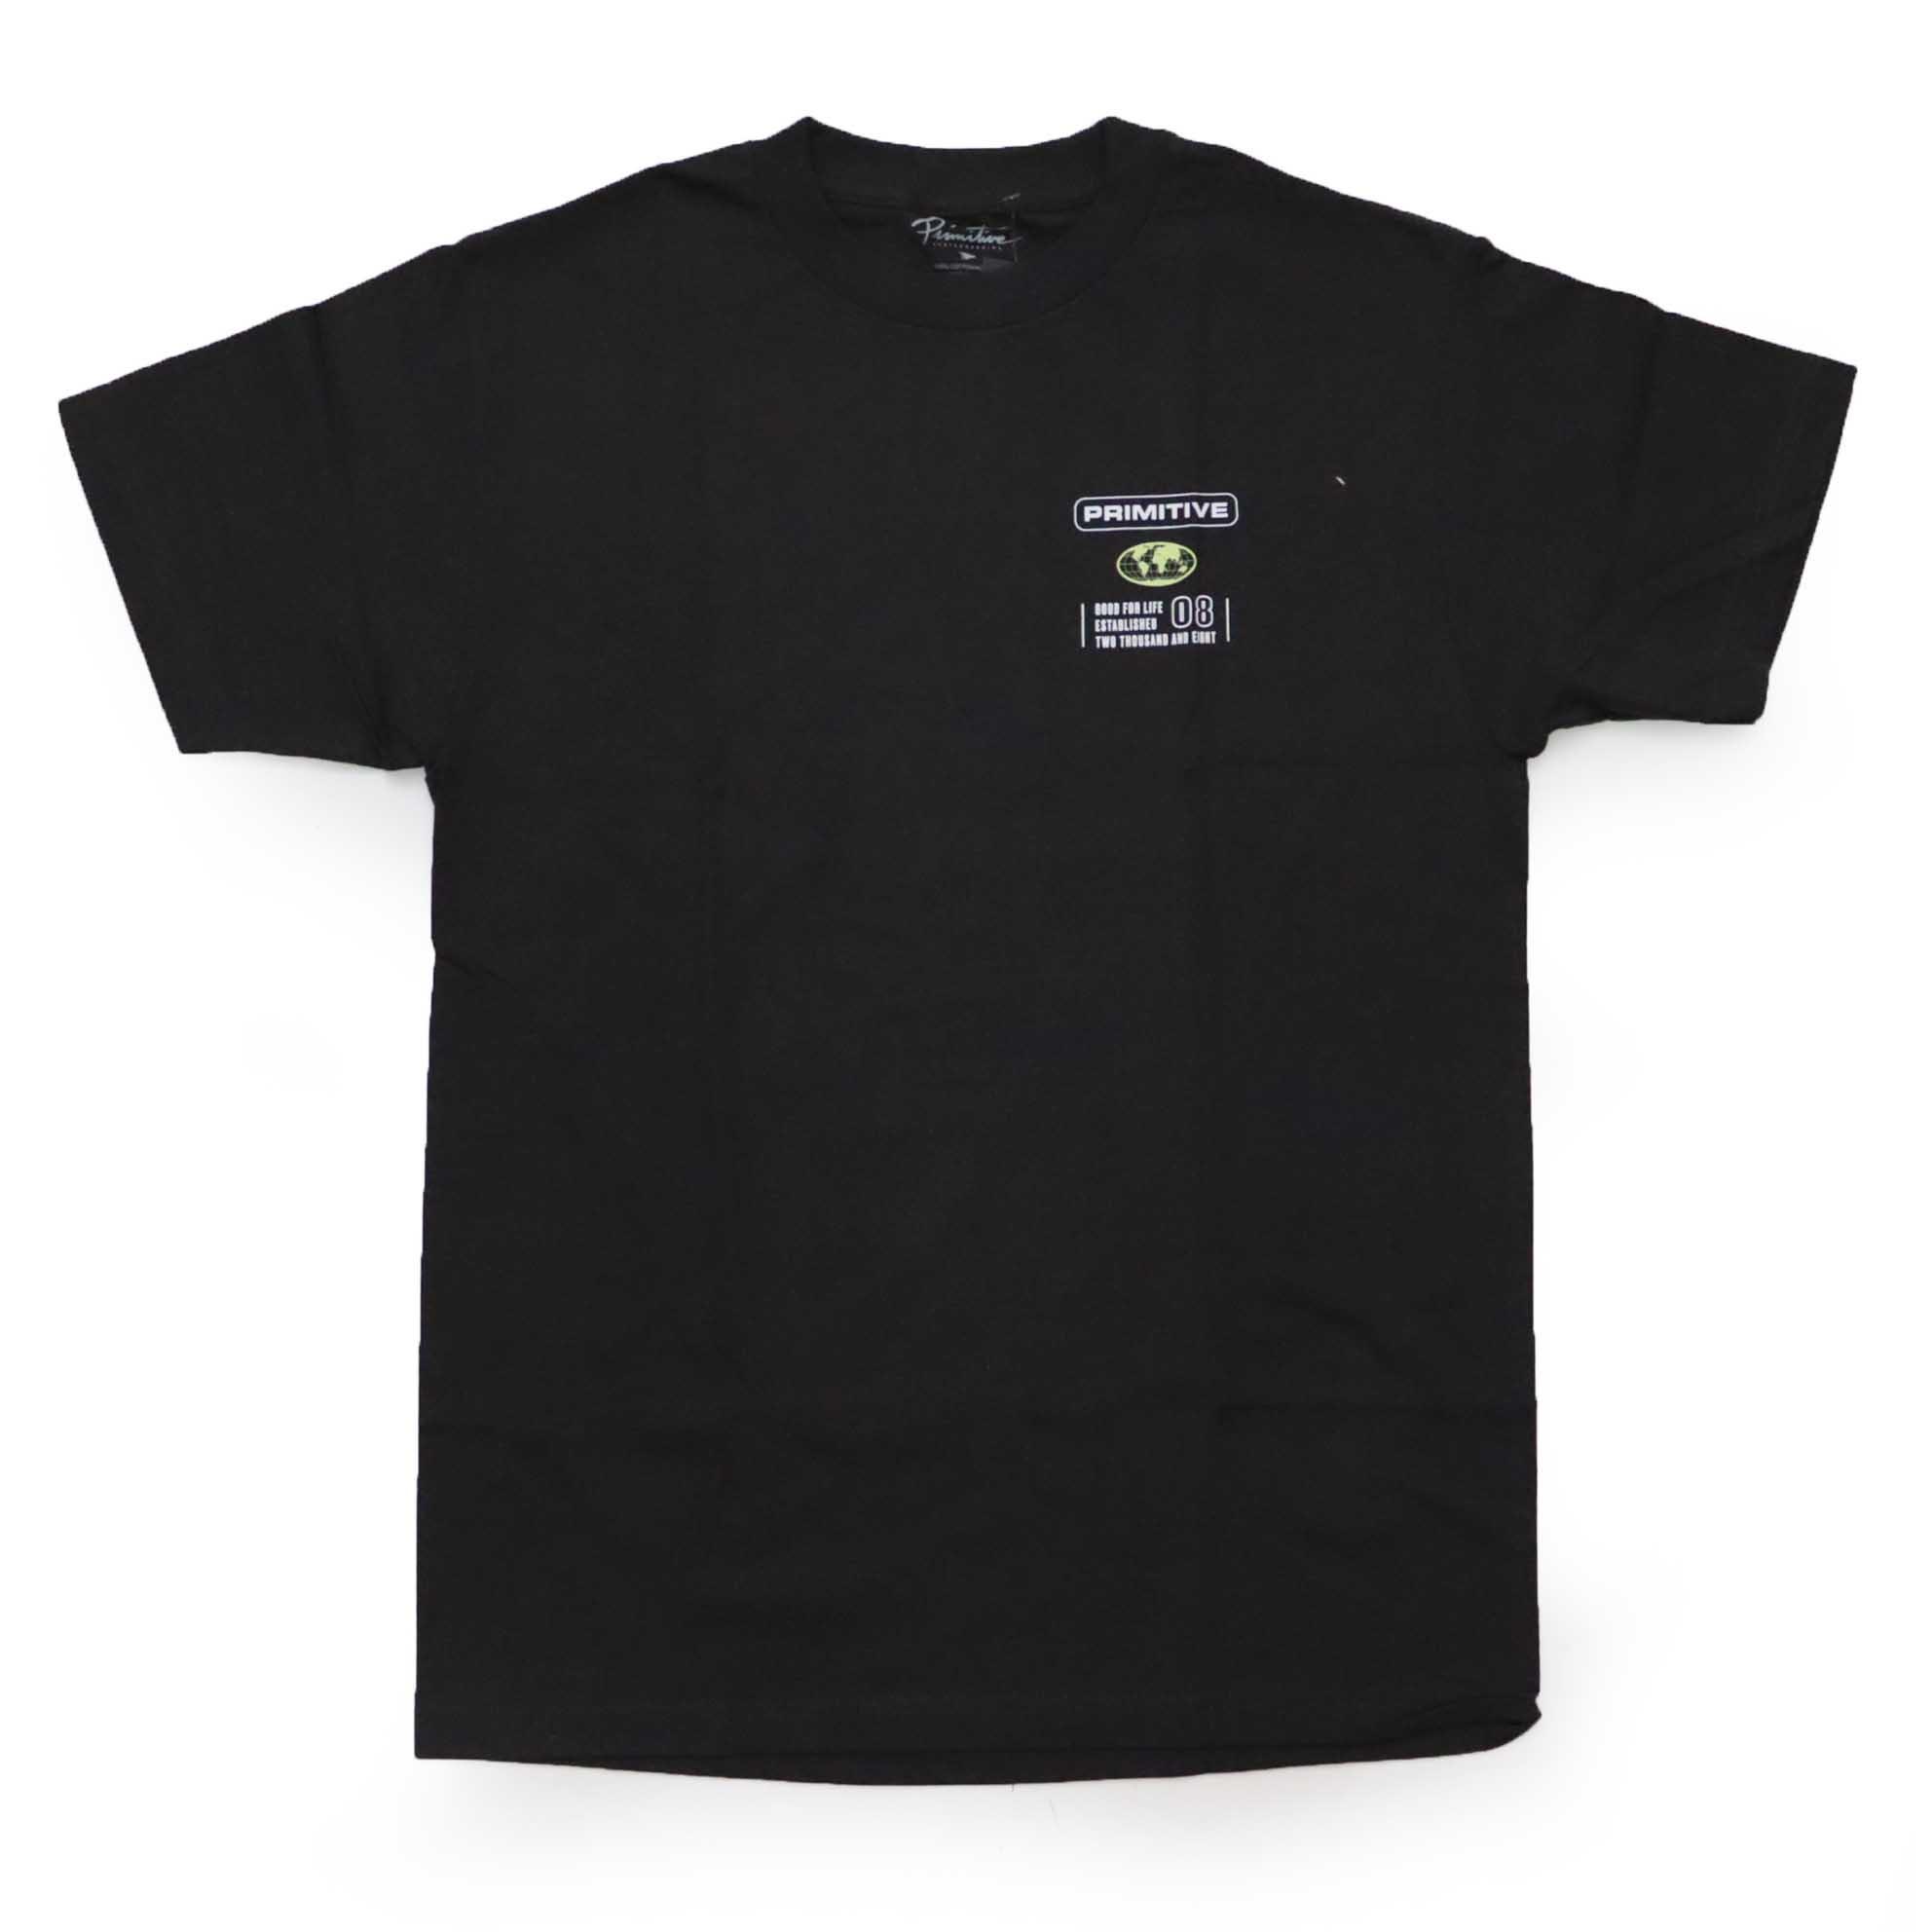 Camiseta Primitive Horizon - Preto (Importado)